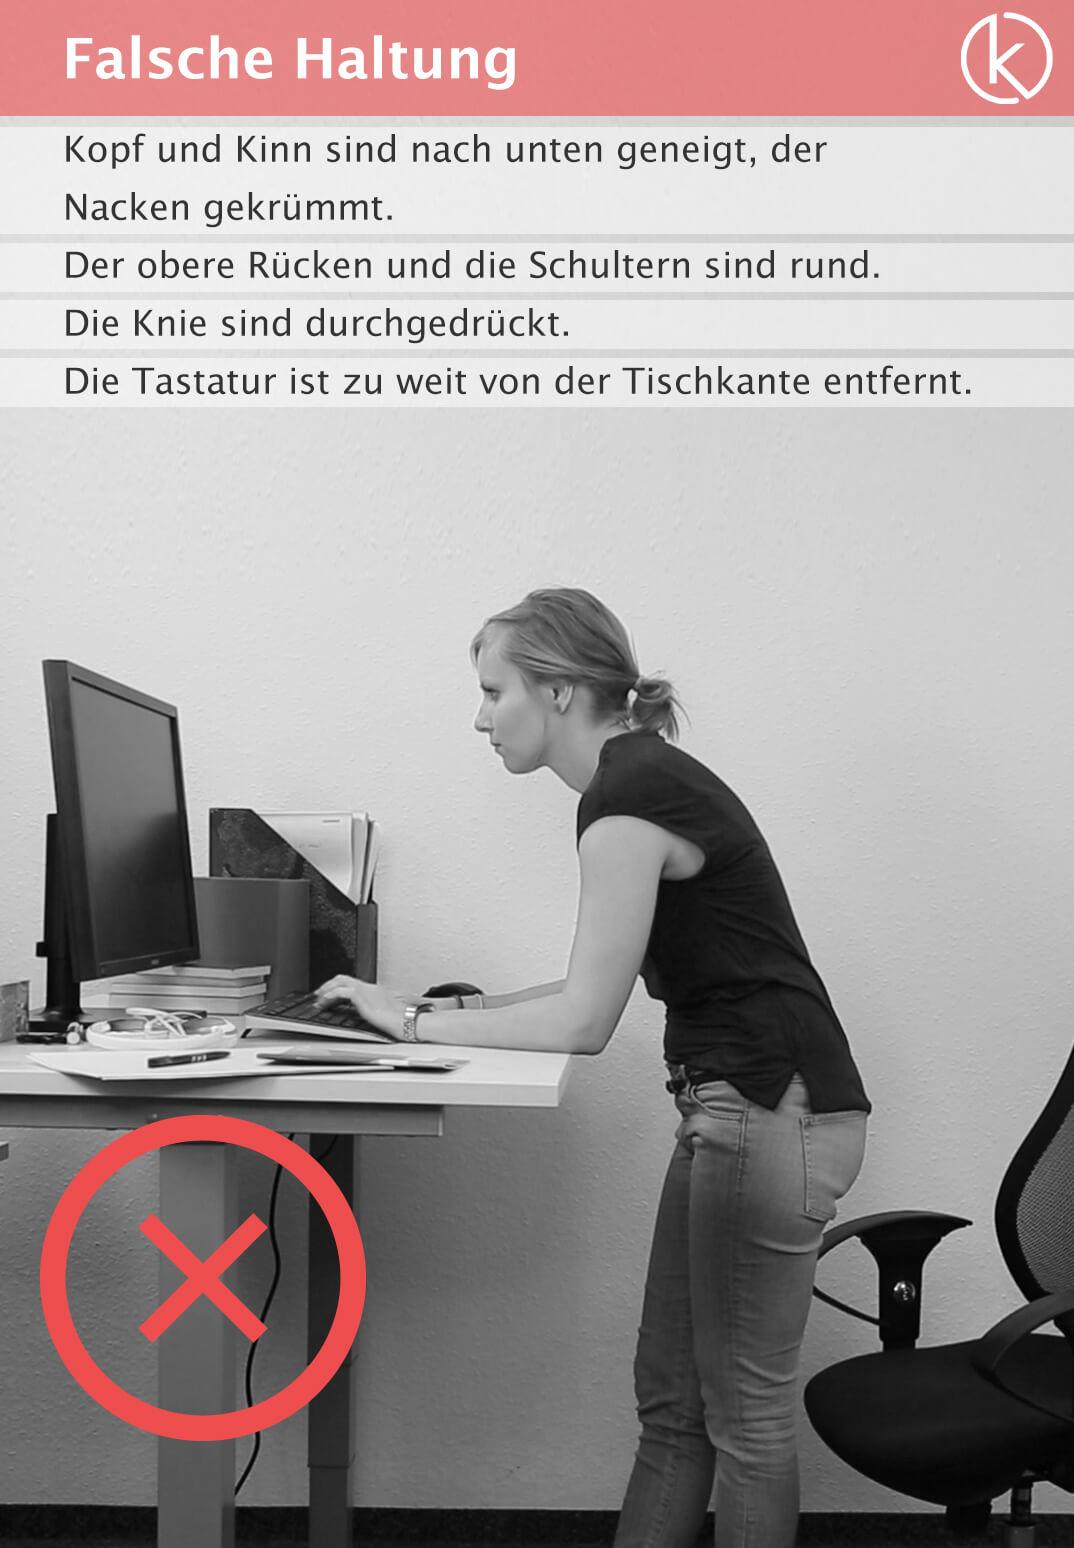 Infografik falsche Haltung am Arbeitsplatz